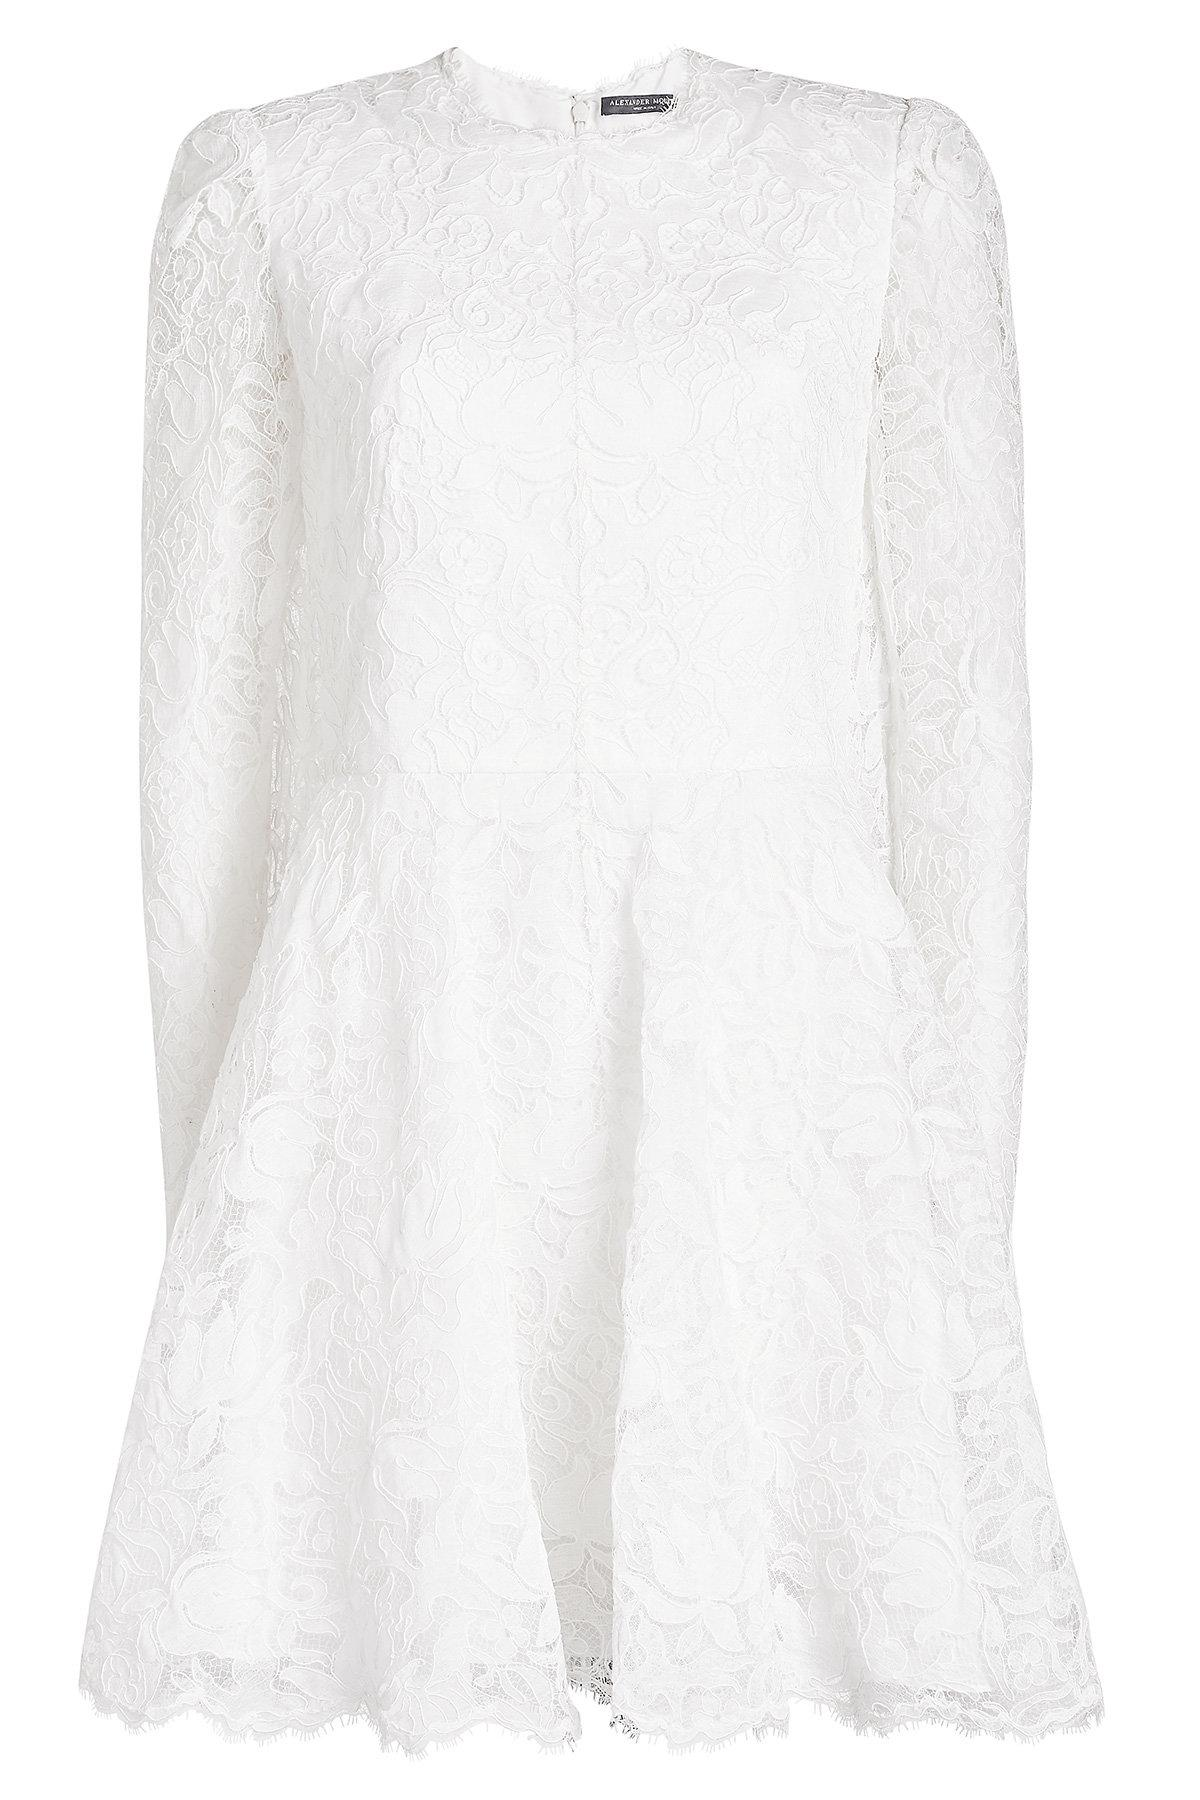 Alexander Mcqueen Lace Dress In White